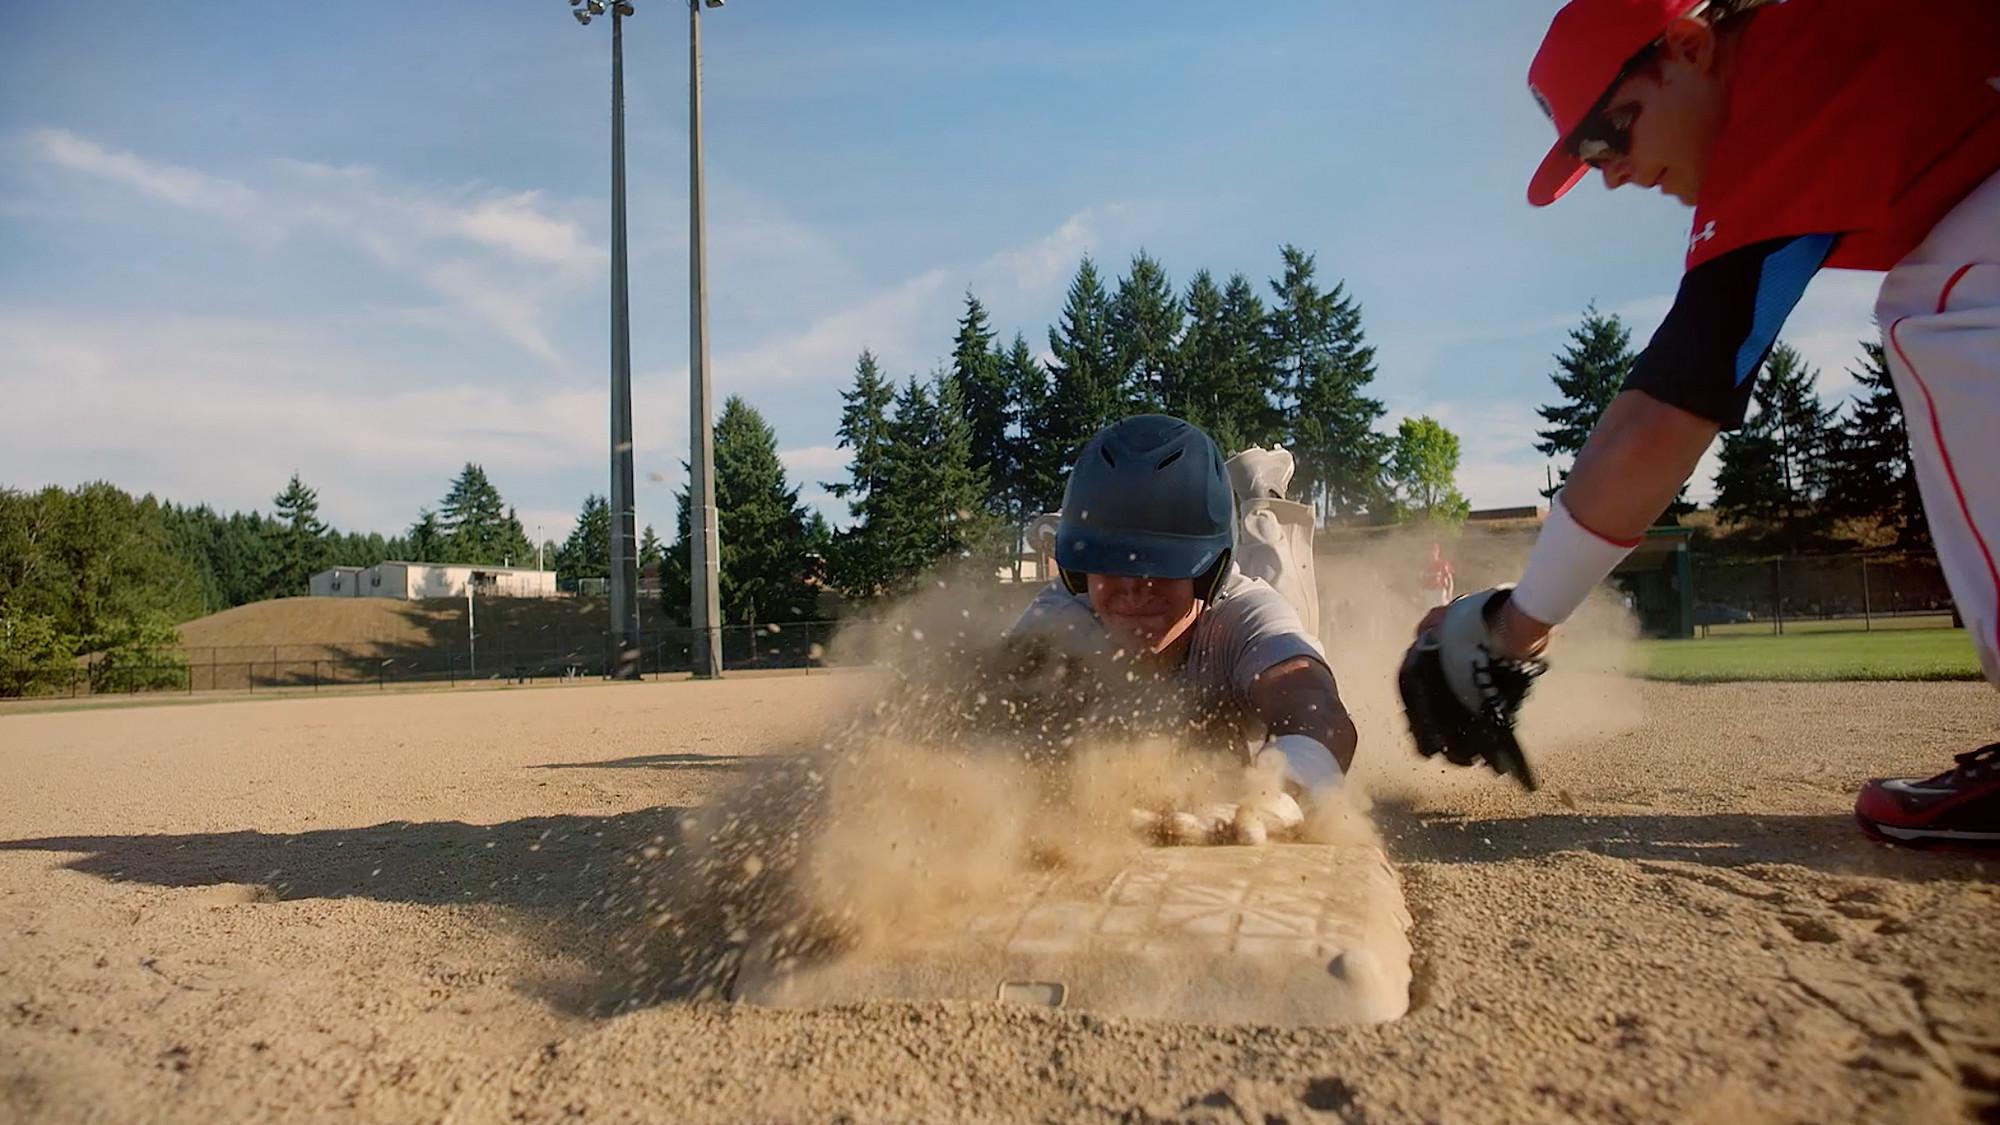 Baseball Gear in Action